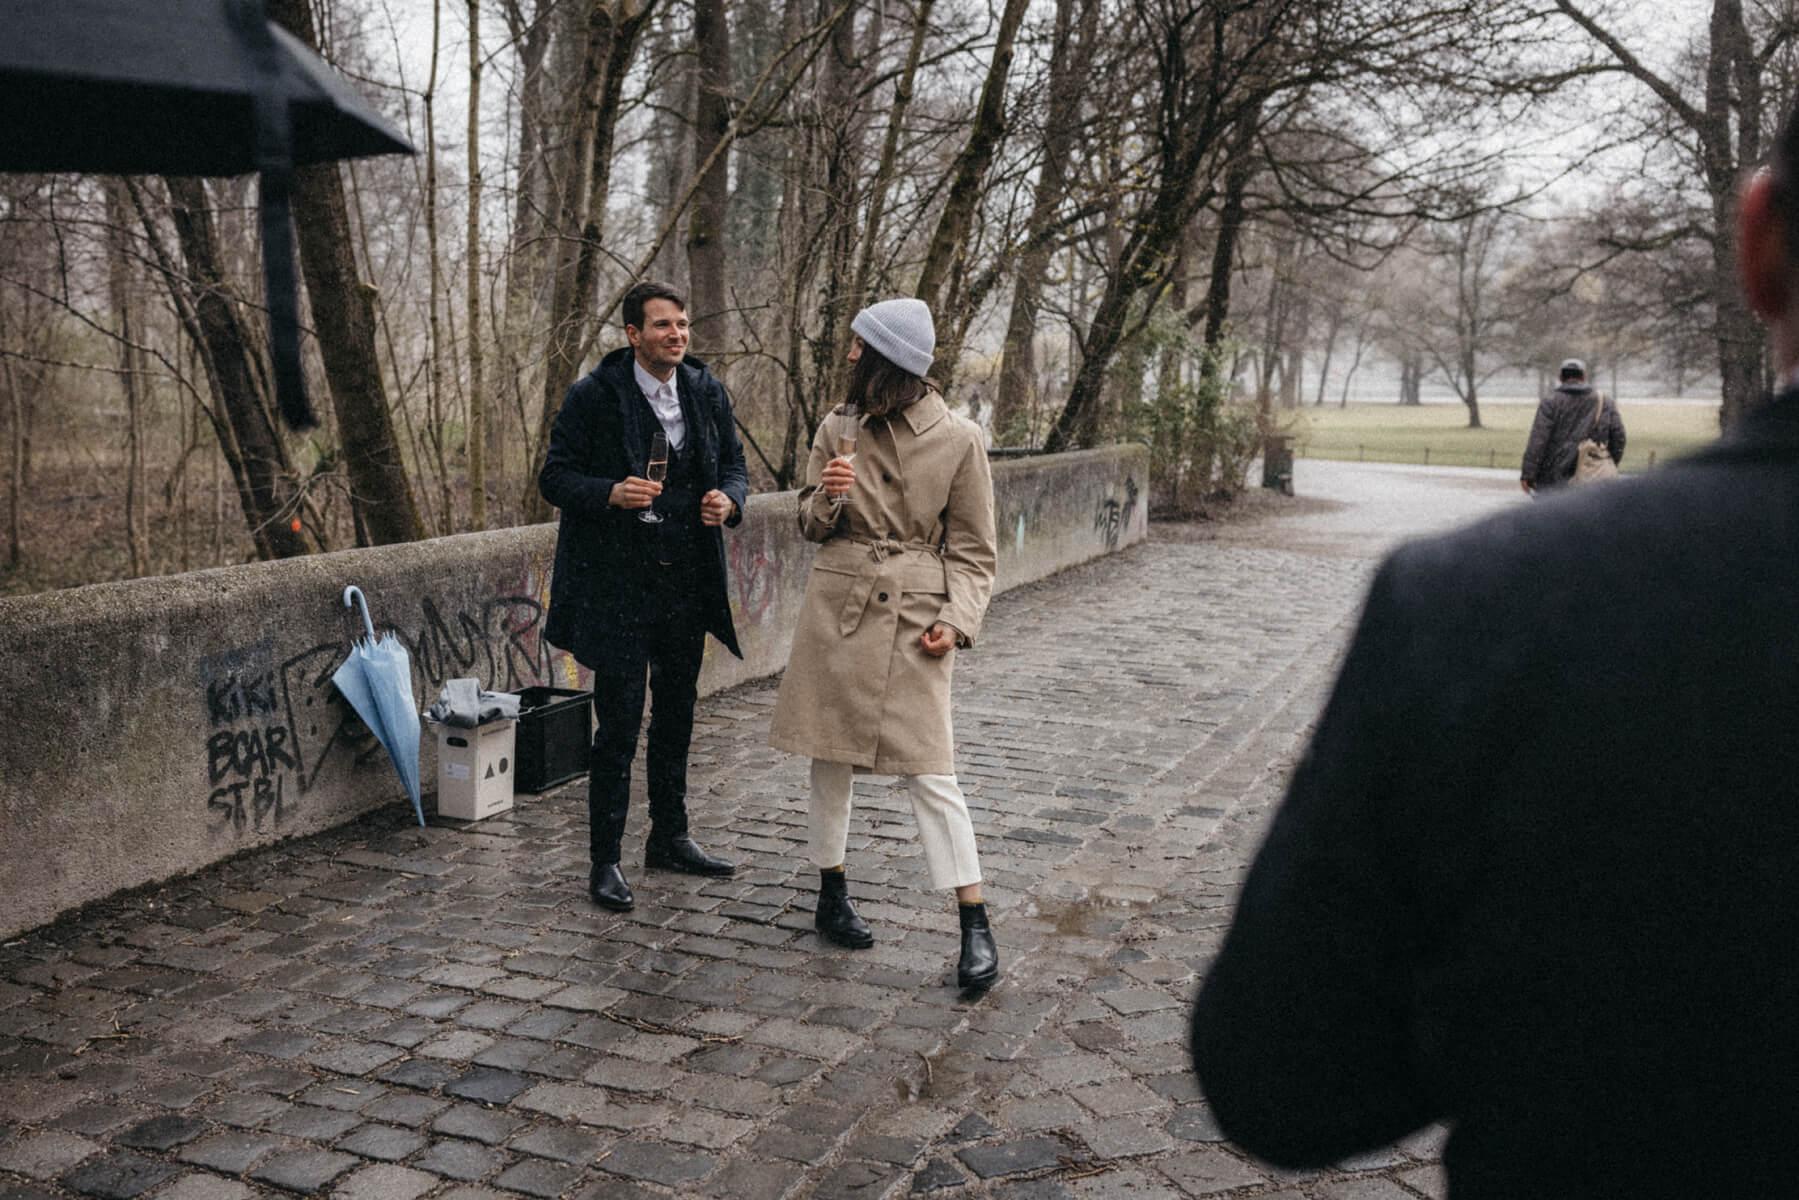 raissa simon fotografie urban civil wedding munich 008 - Nikolija + Niko